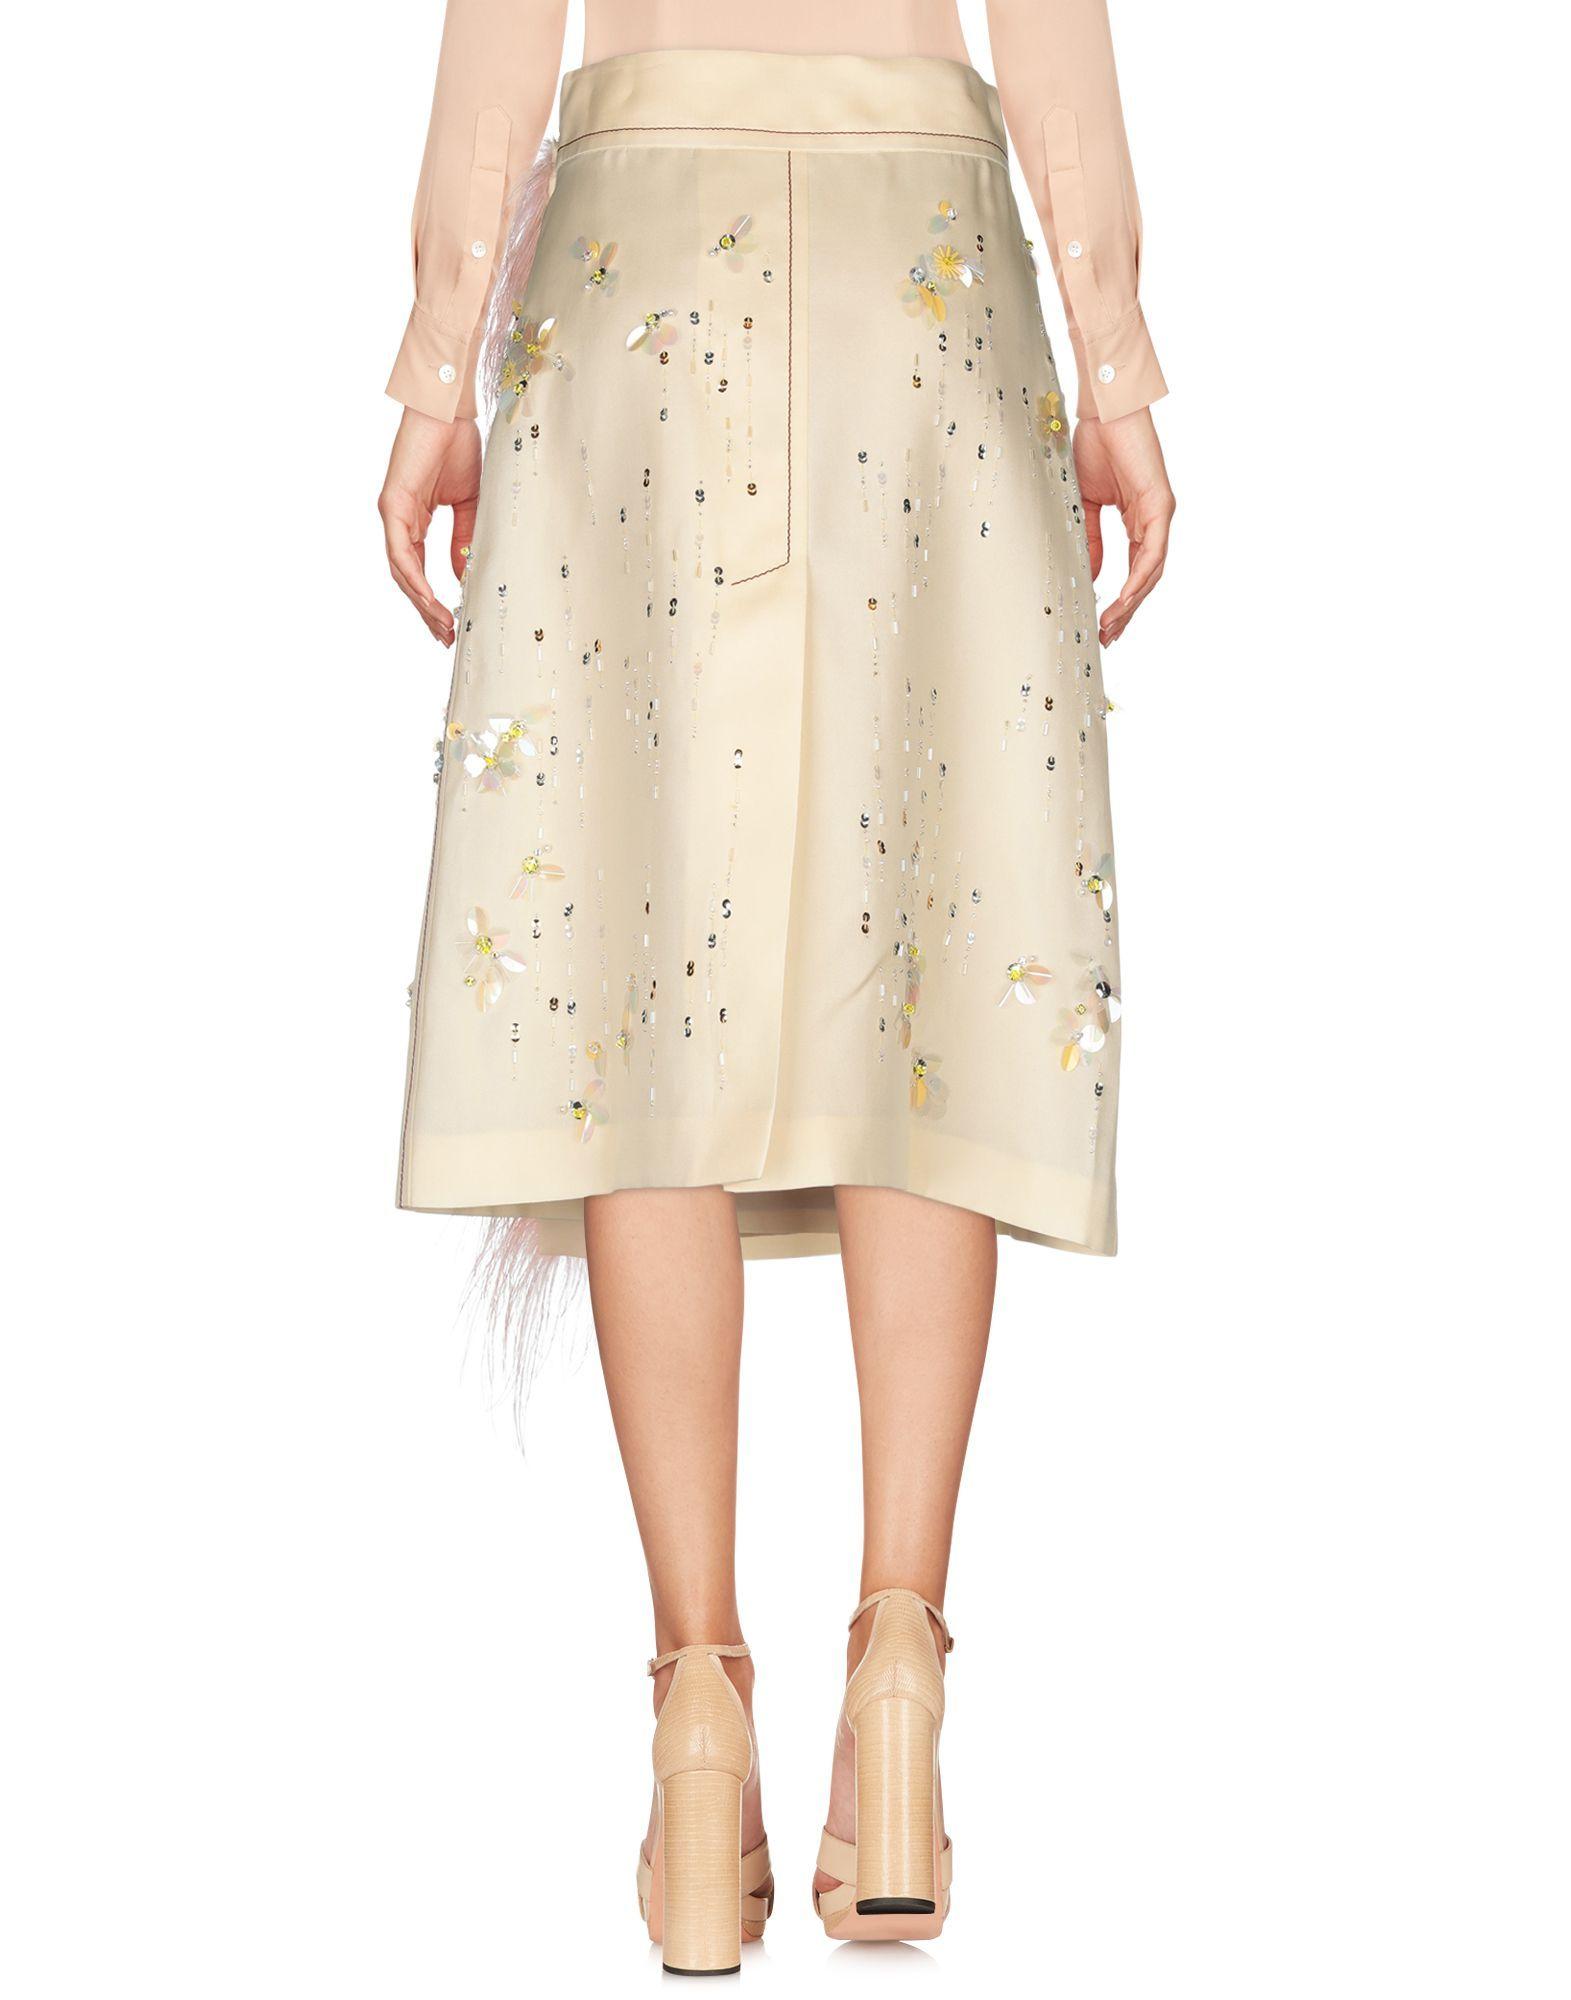 SKIRTS Woman Prada Ivory Silk